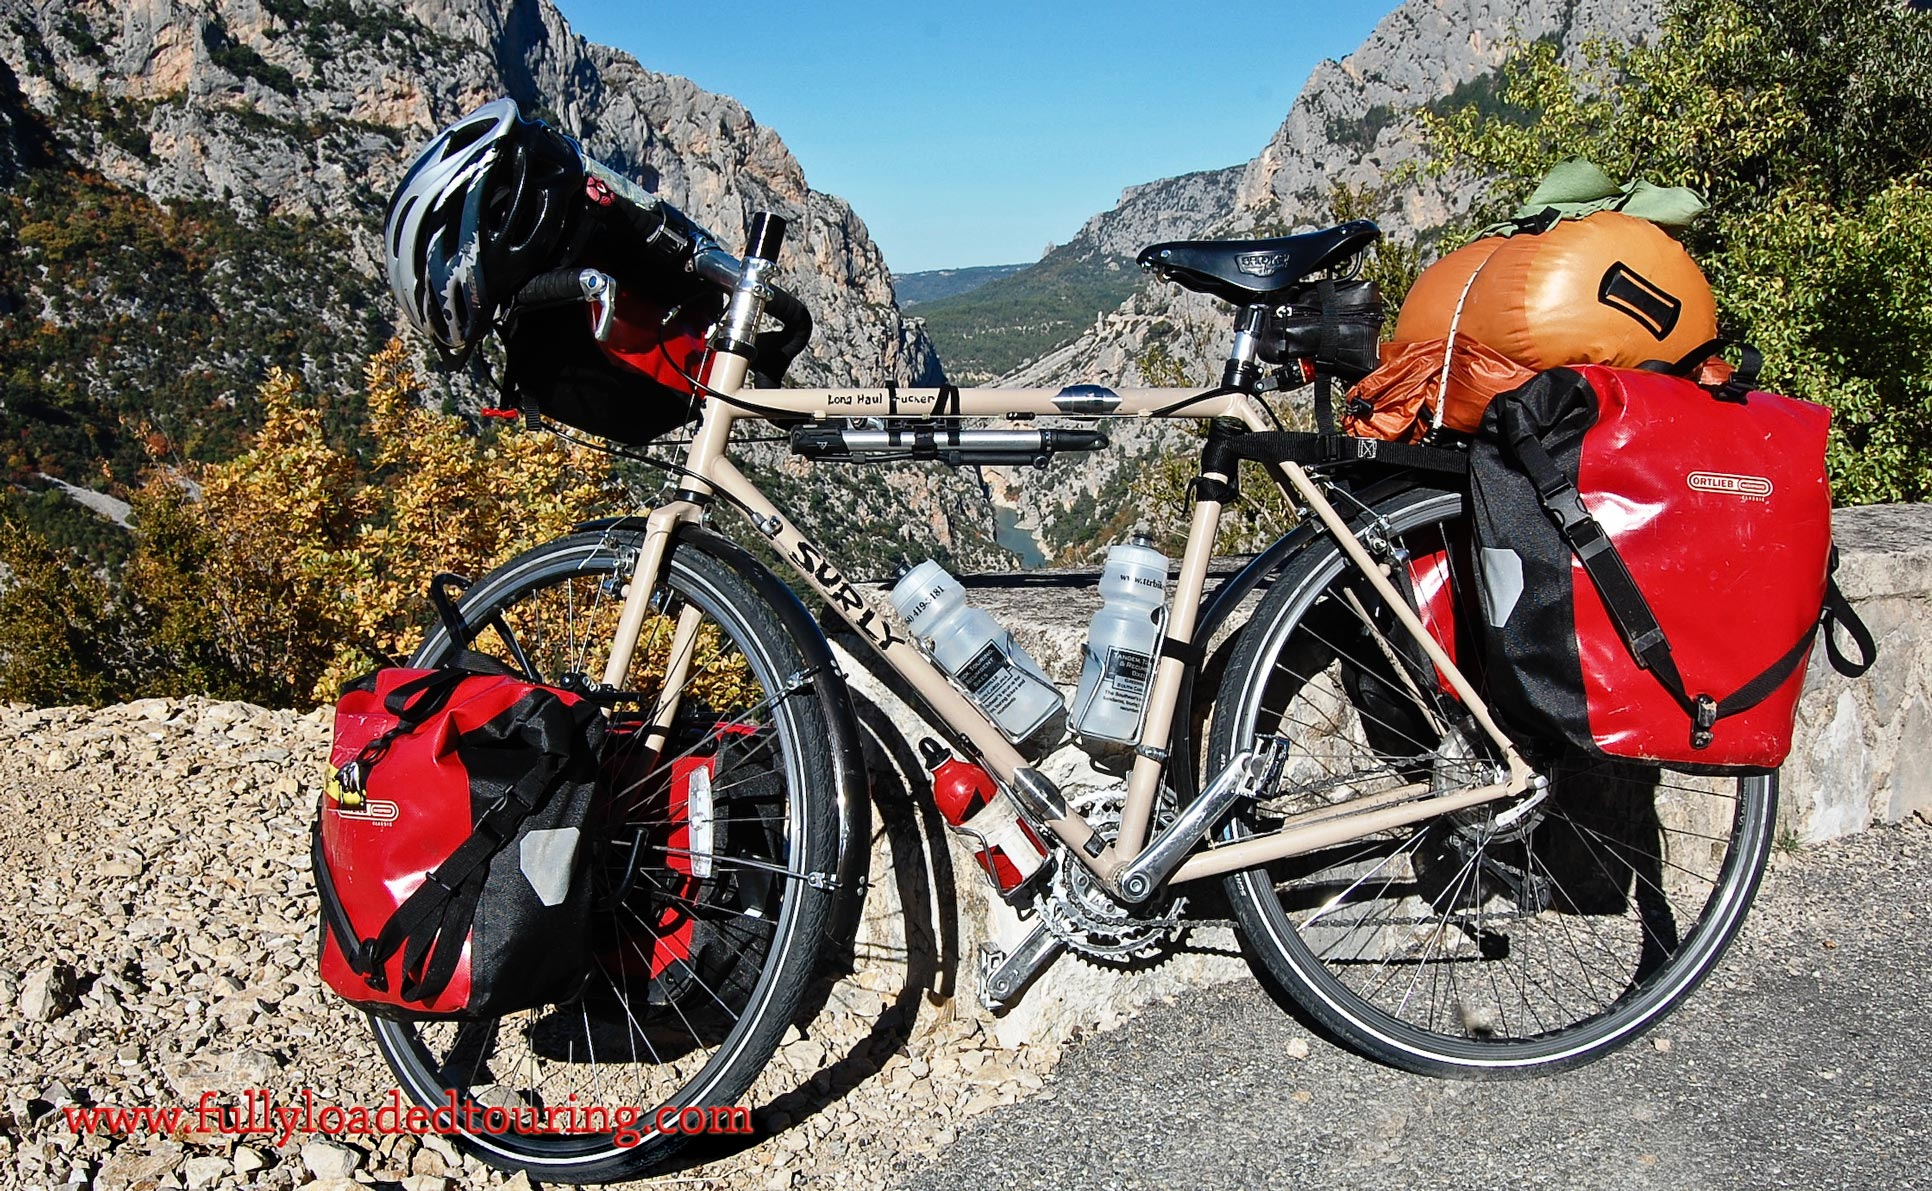 336    Richard - Touring France - Surly Long Haul Trucker touring bike